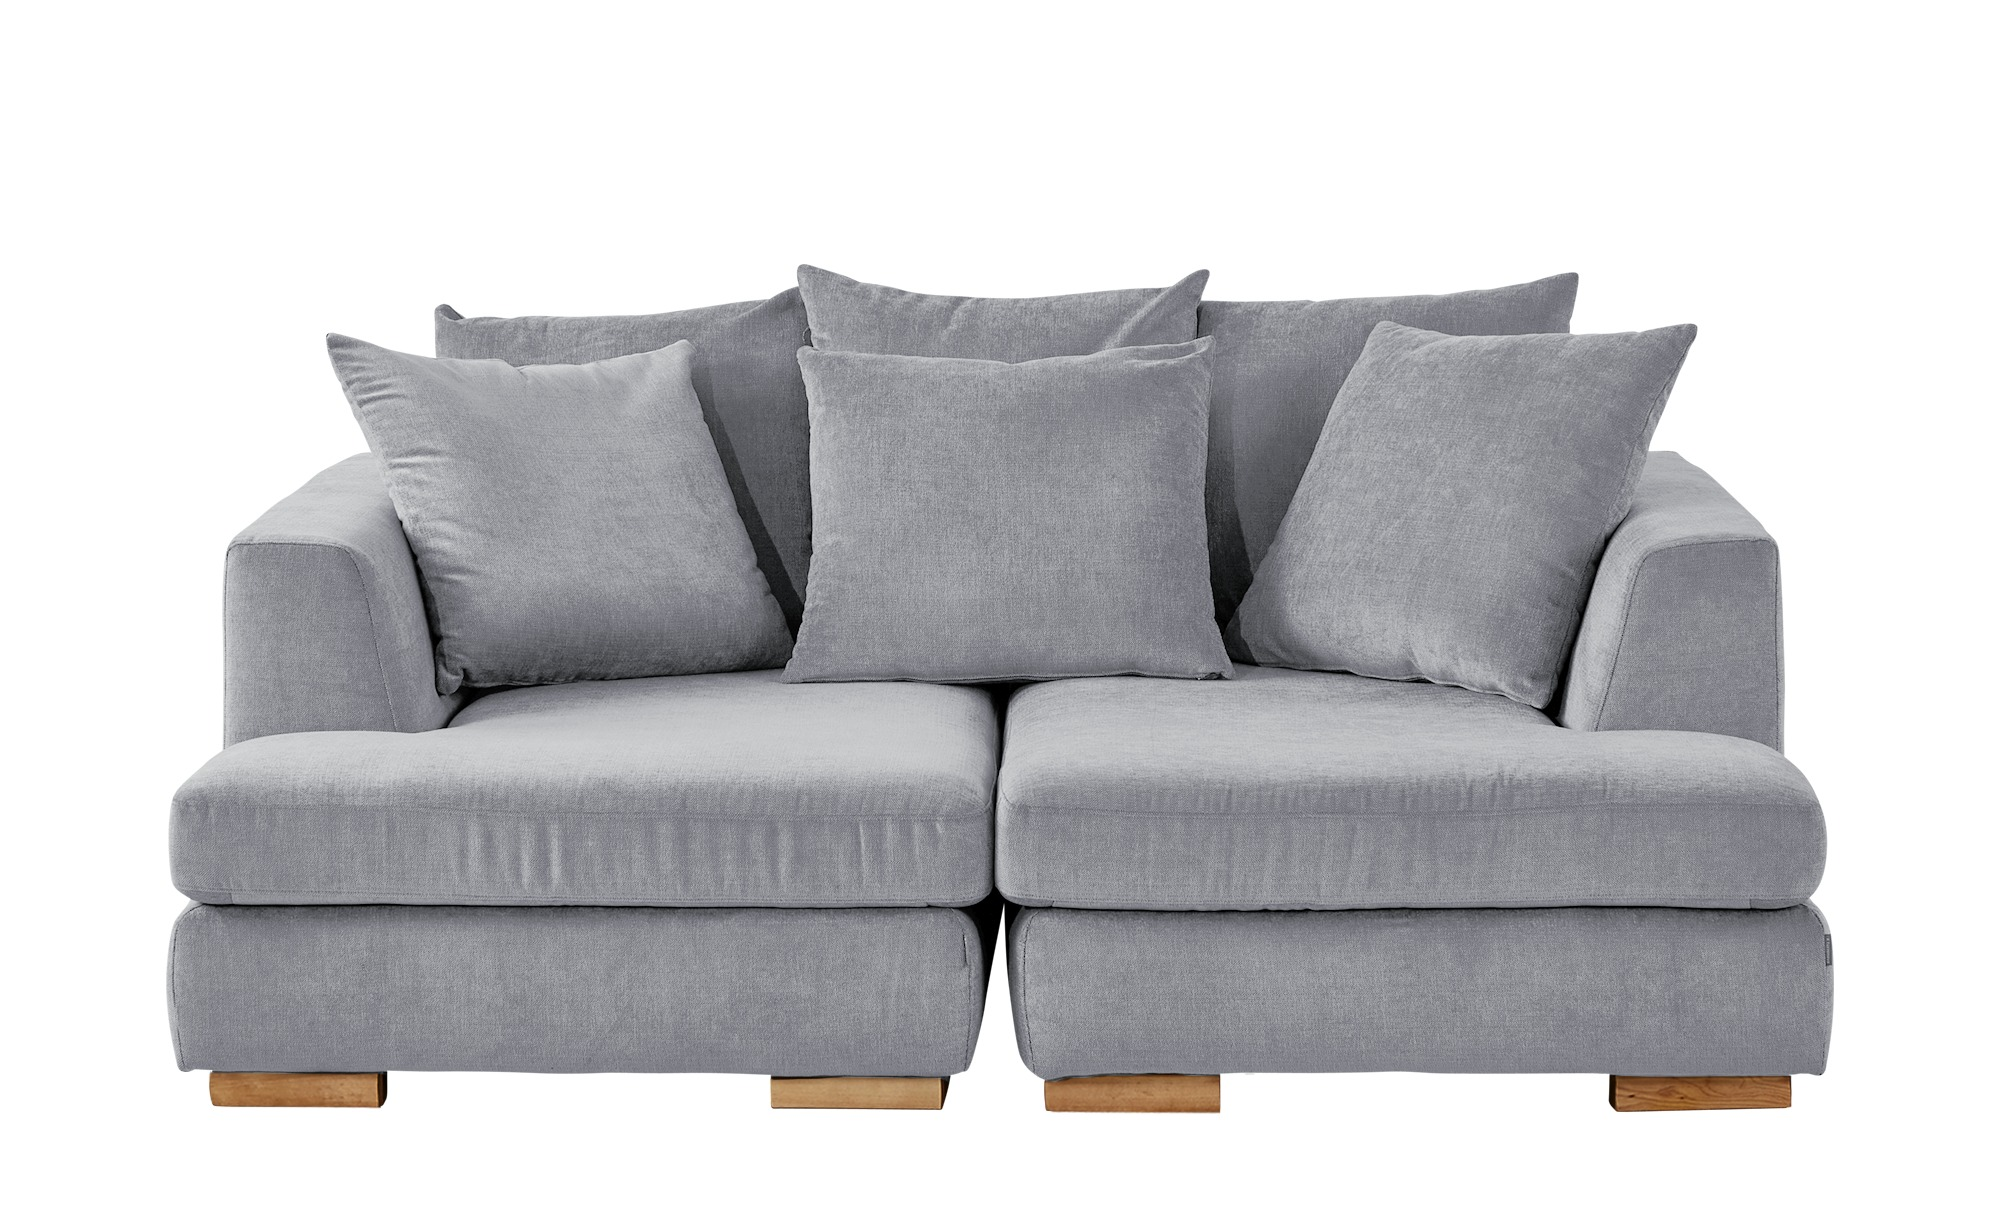 SOHO Loveseat grau - Webstoff Paso Doble ¦ silber ¦ Maße (cm): B: 202 H: 80 T: 156 Polstermöbel > Sofas > 2-Sitzer - Höffner